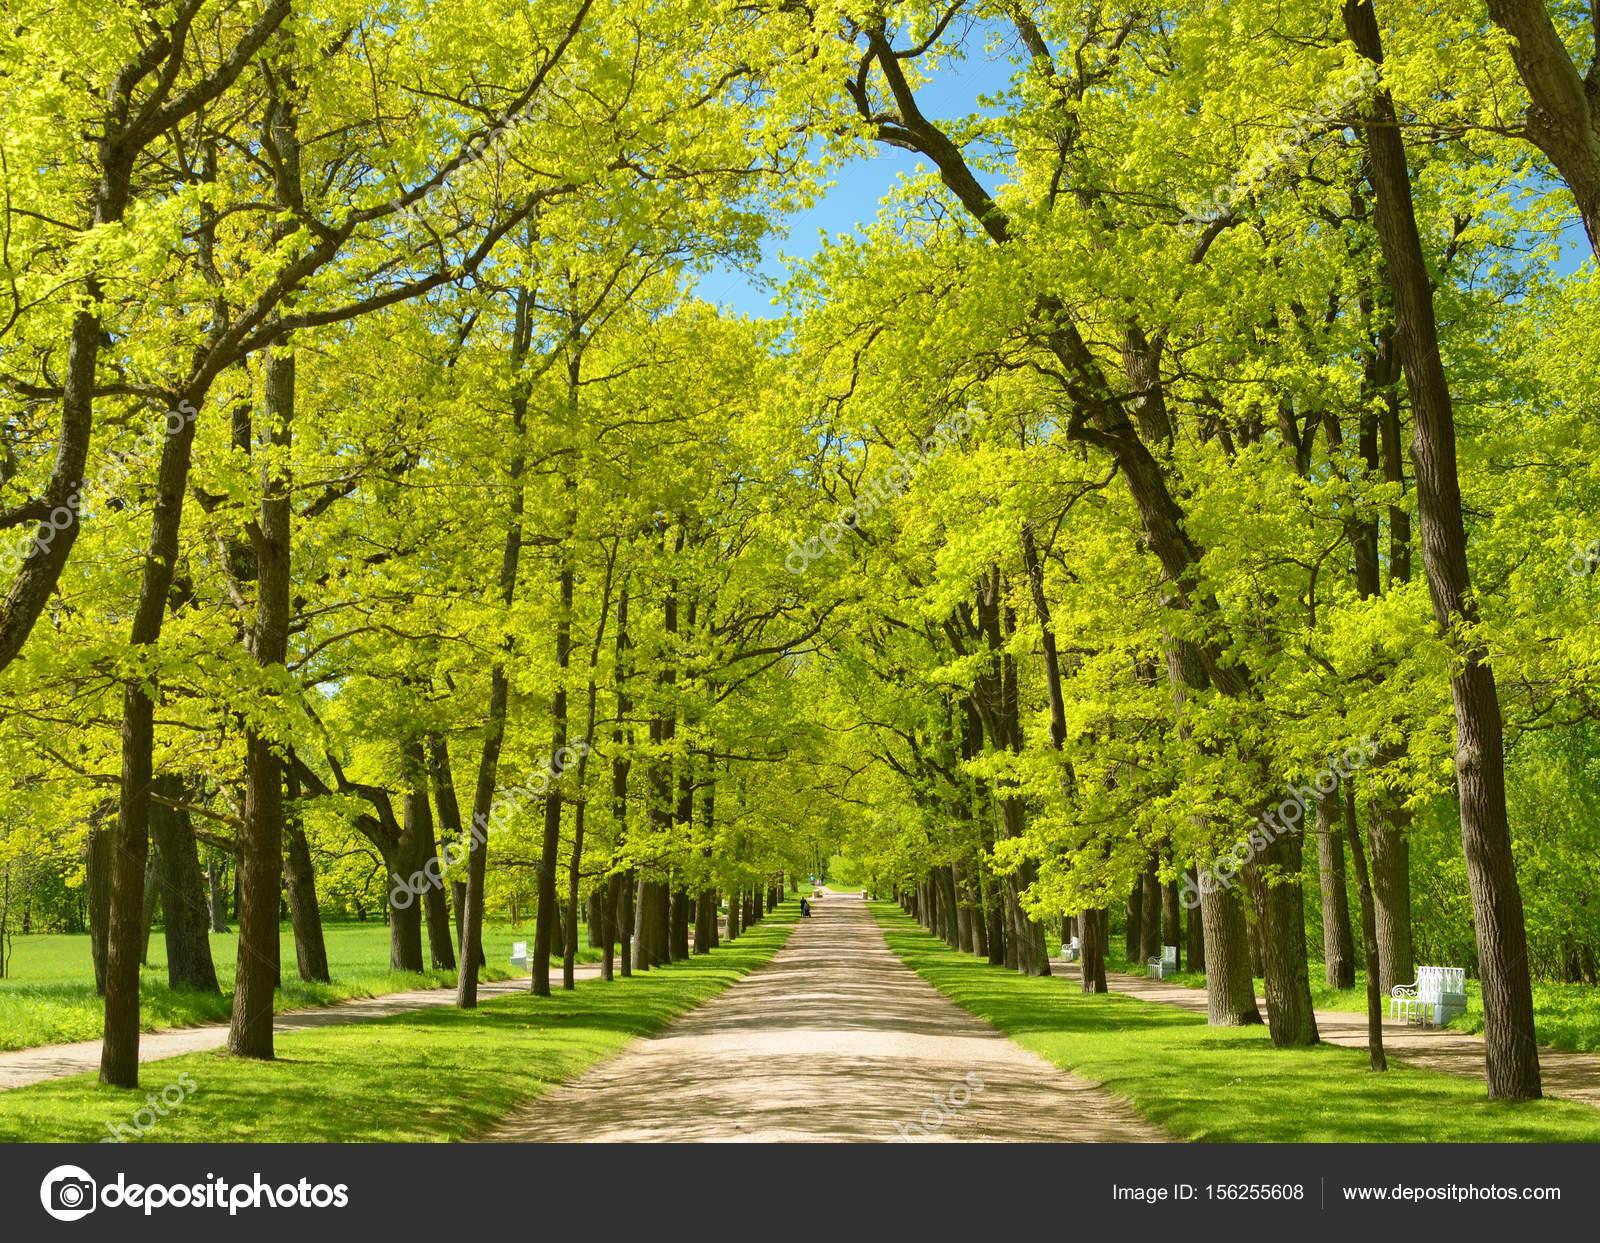 Imagenes De Paisajes De Primavera: El Paisaje Natural En La Primavera